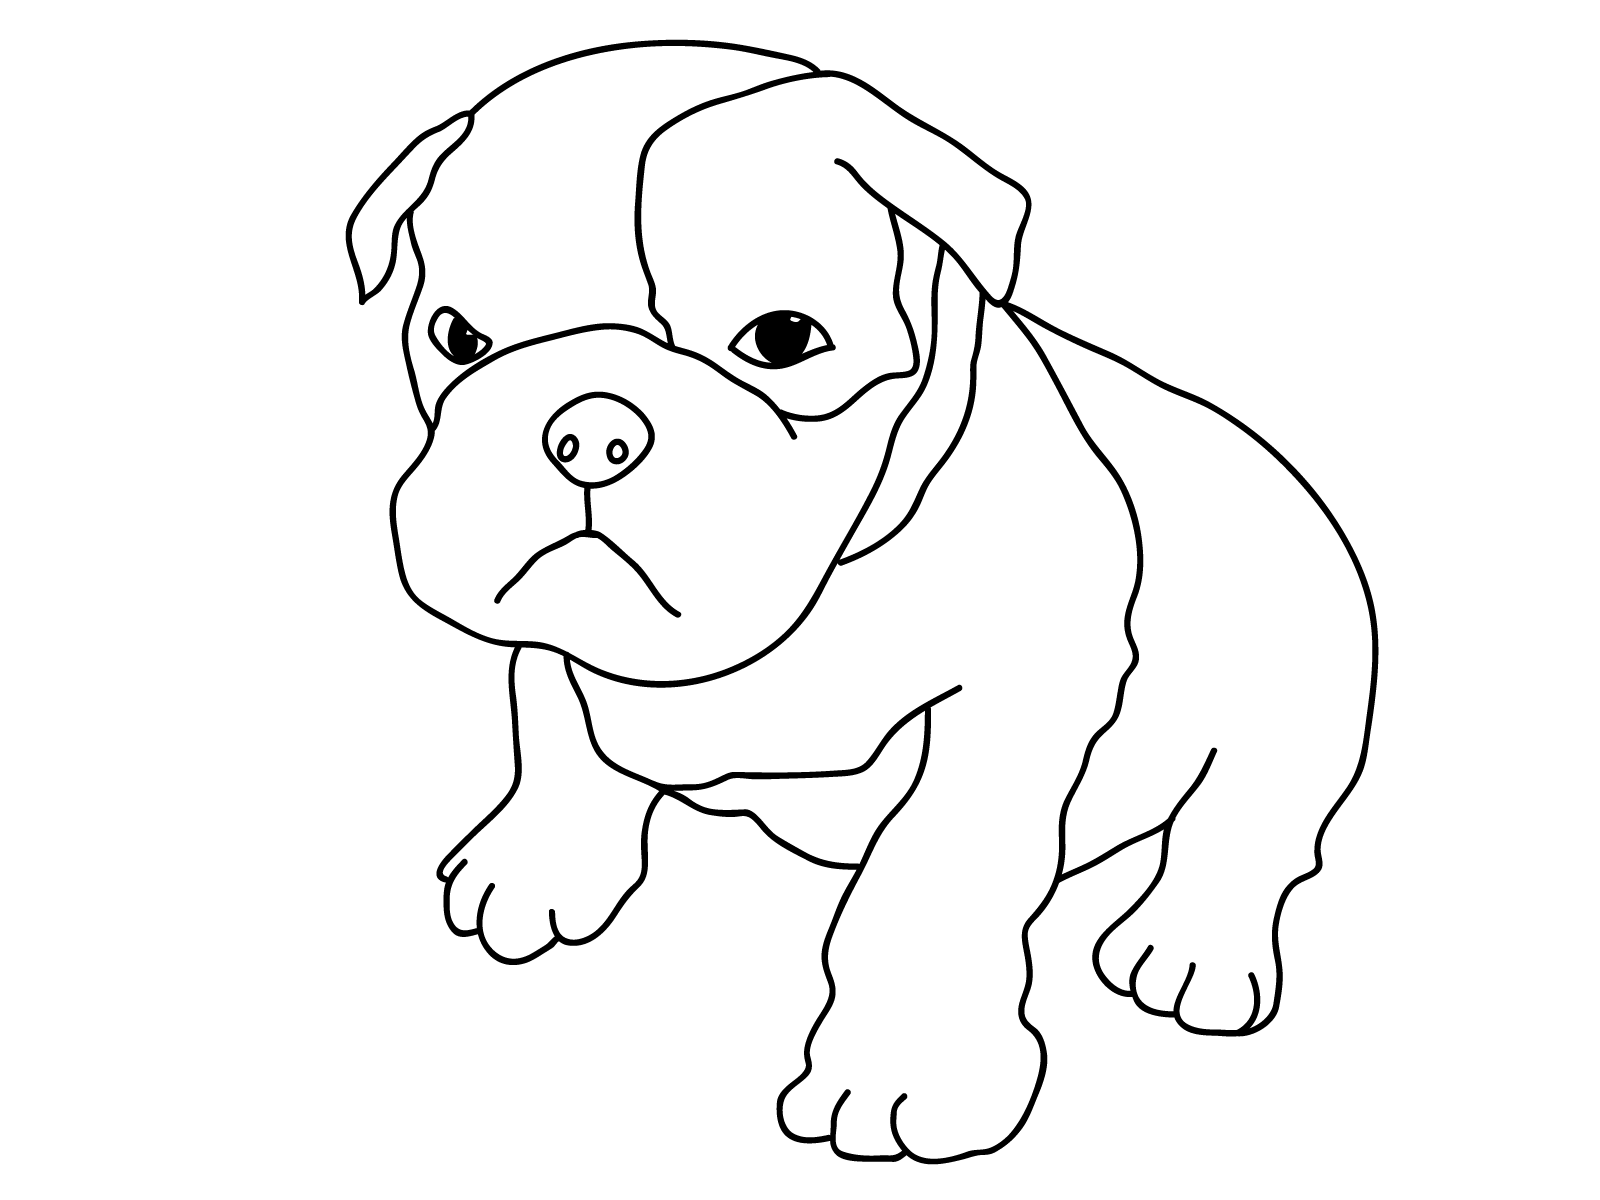 colouring page of dog free printable dog coloring pages for kids colouring page of dog